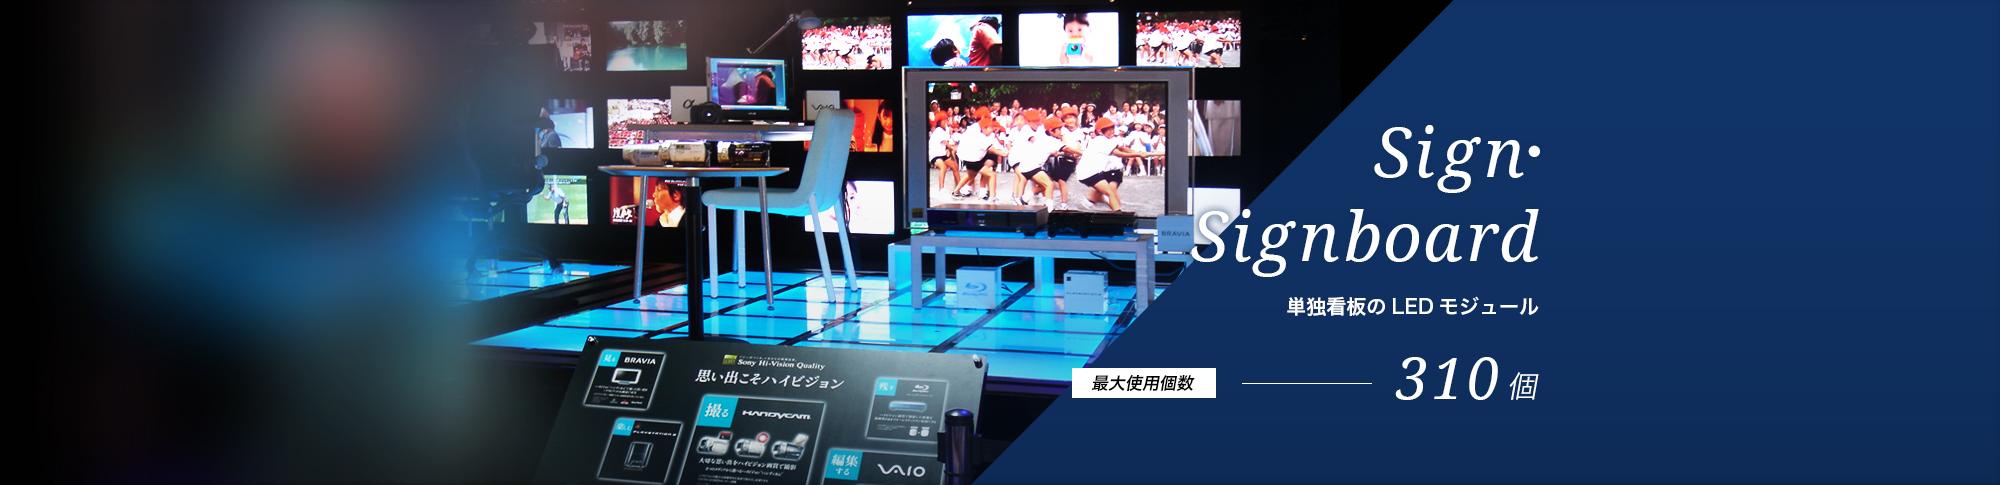 Sign・Signboard 単独看板のLEDモジュール 最大使用個数310個